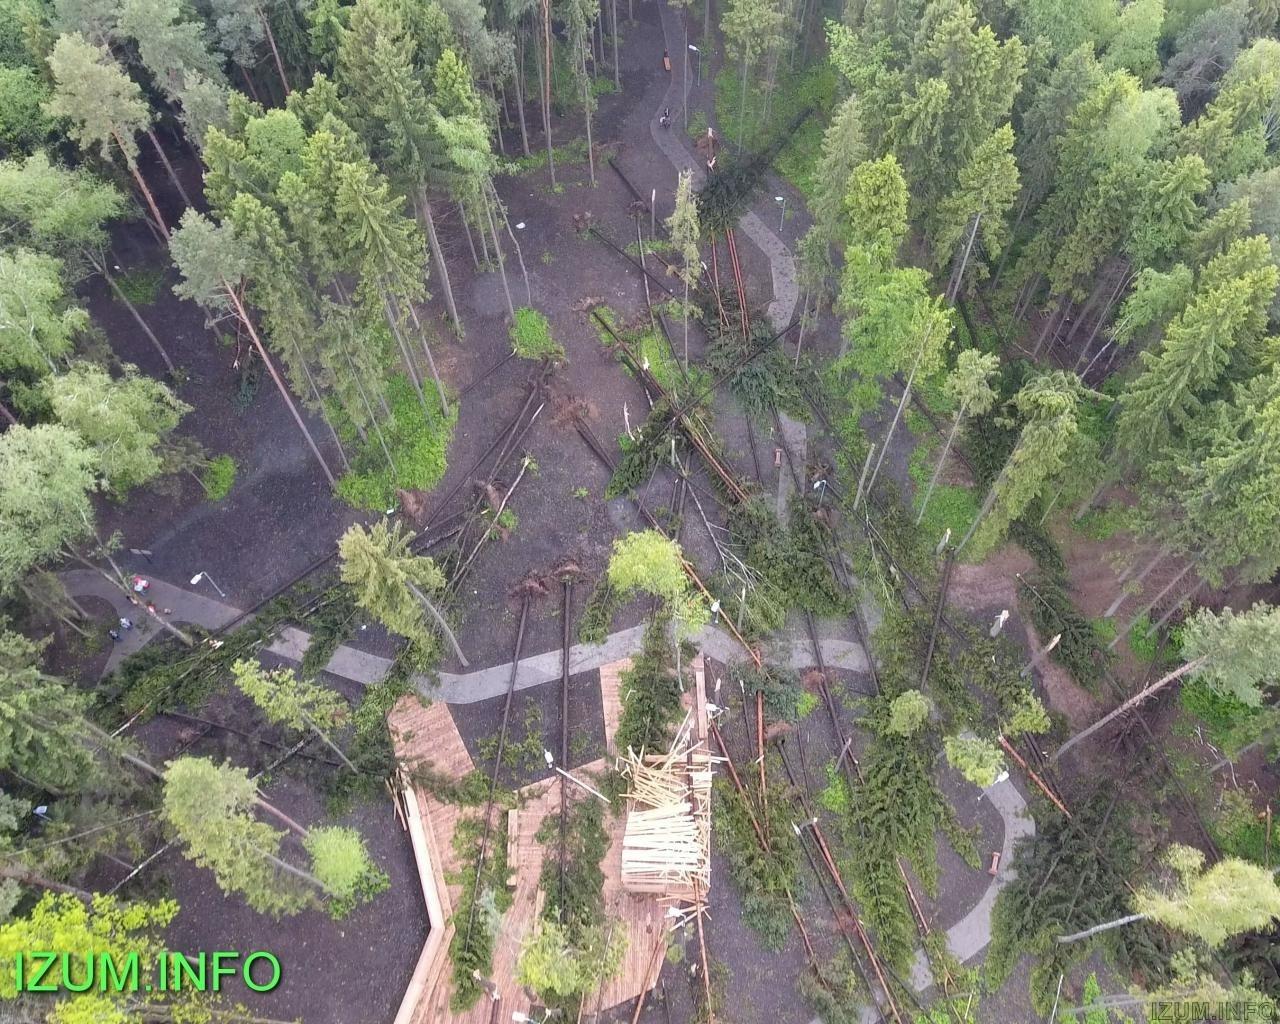 Изумрудные холмы парк после урагана (6).jpg